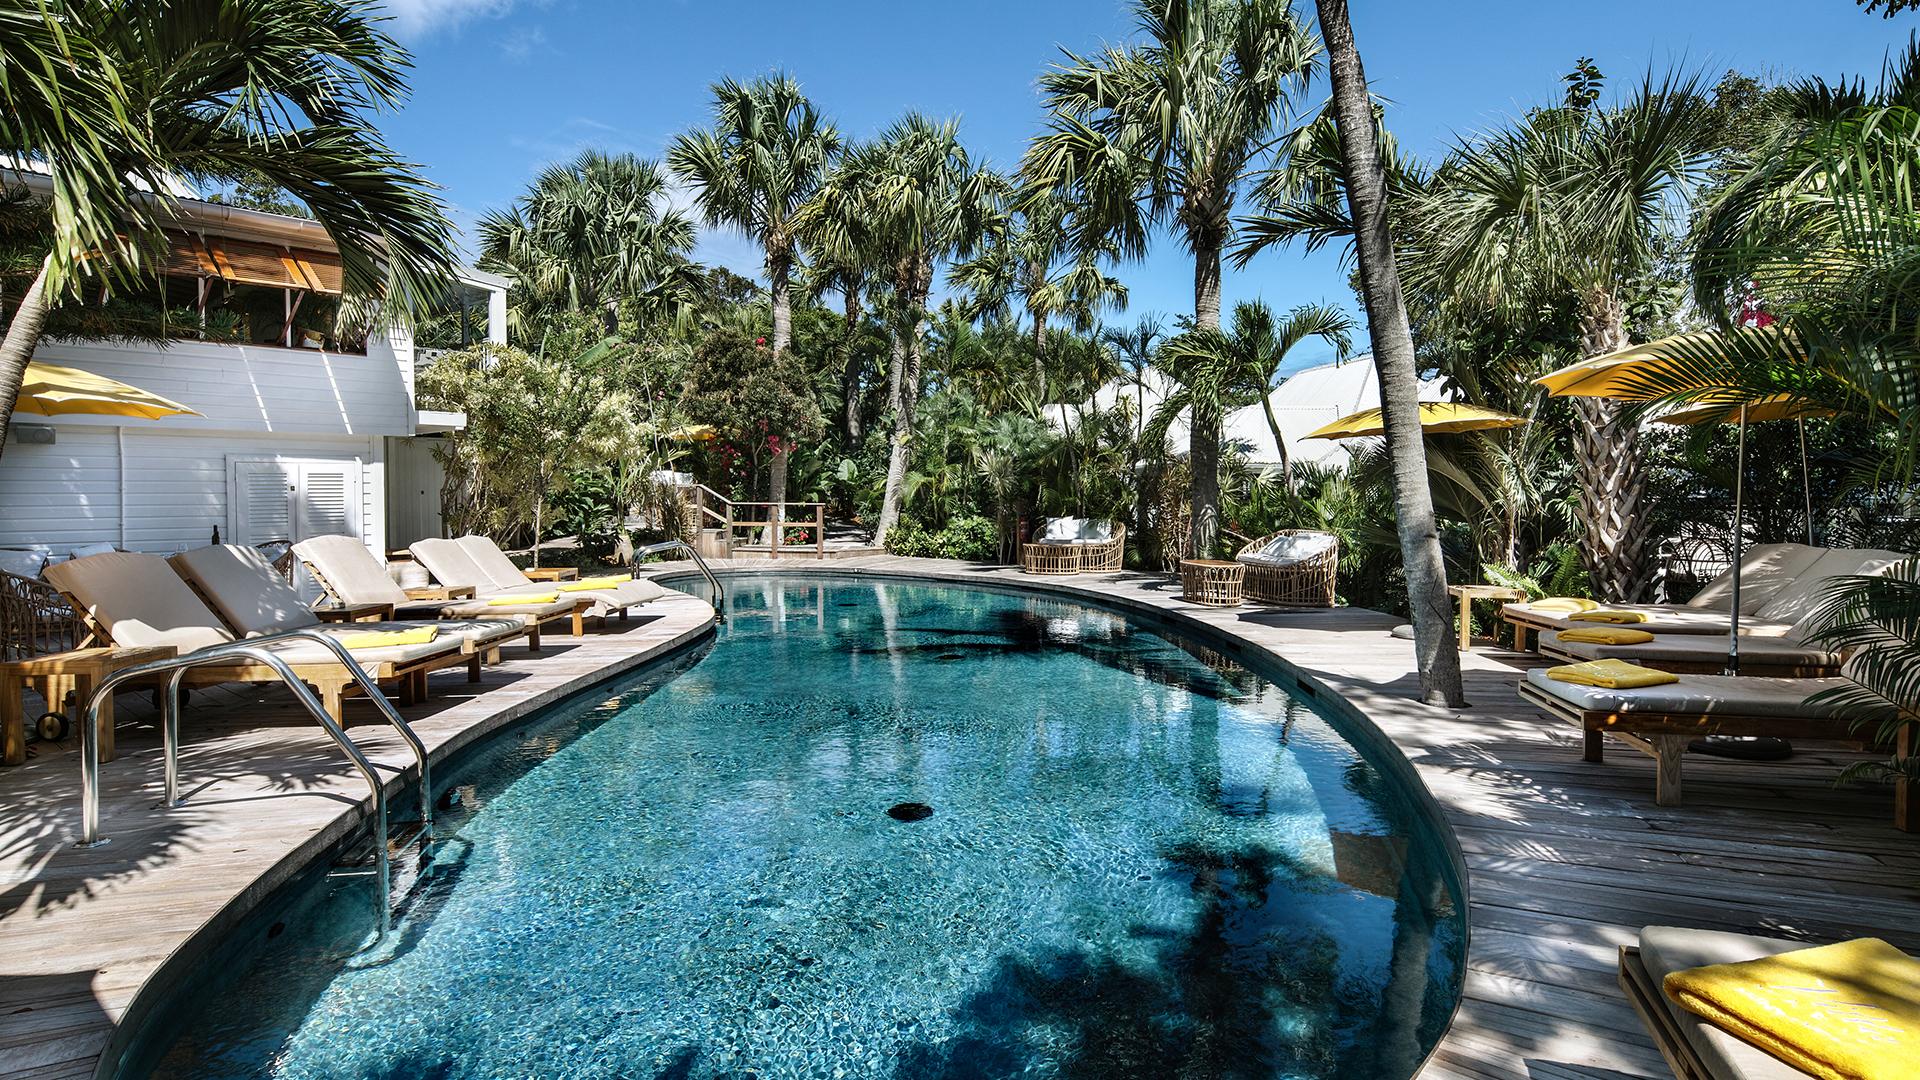 Hotel with pool - Villa Marie Saint-Barth